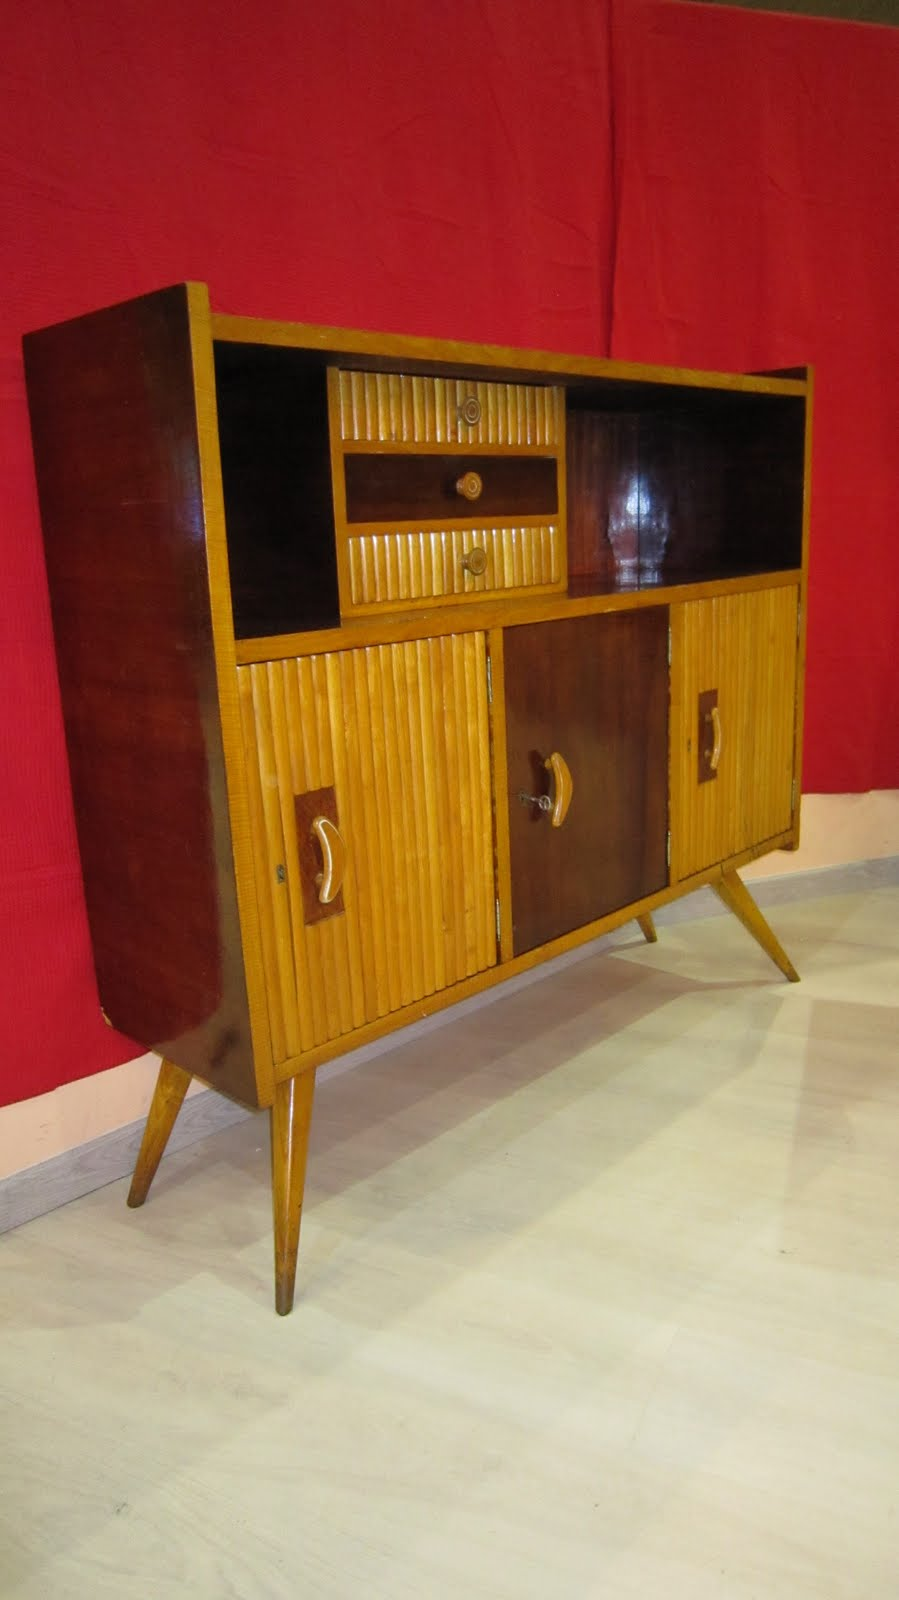 Vintager a mueble aparador a os 50 for Aparador anos 50